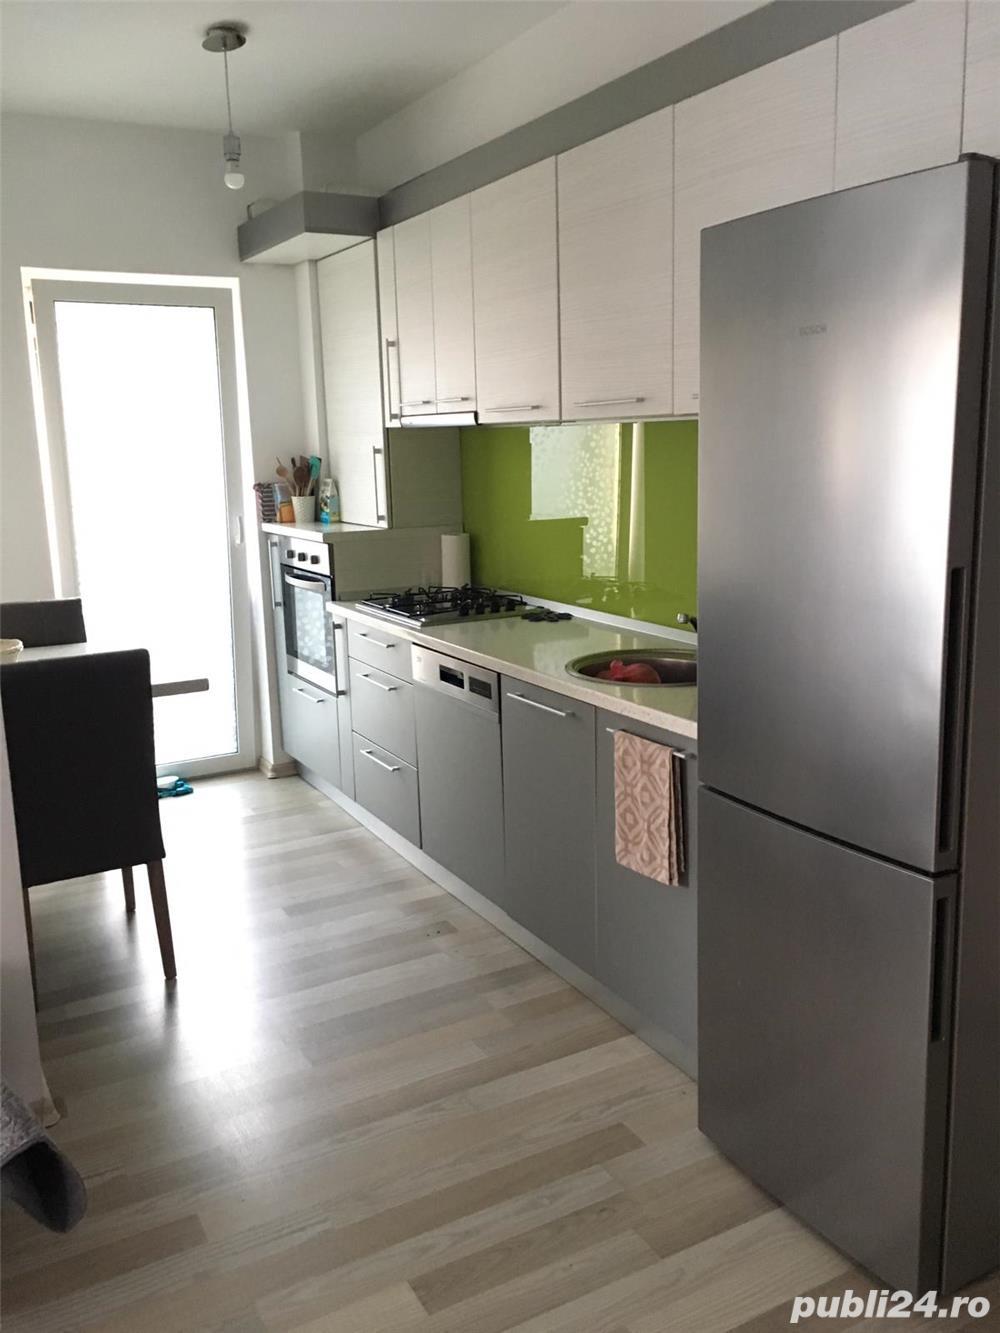 Inchiriez 1 camera din apartament cu 2 dormitoare in Citadela Residence, Cluj Napoca